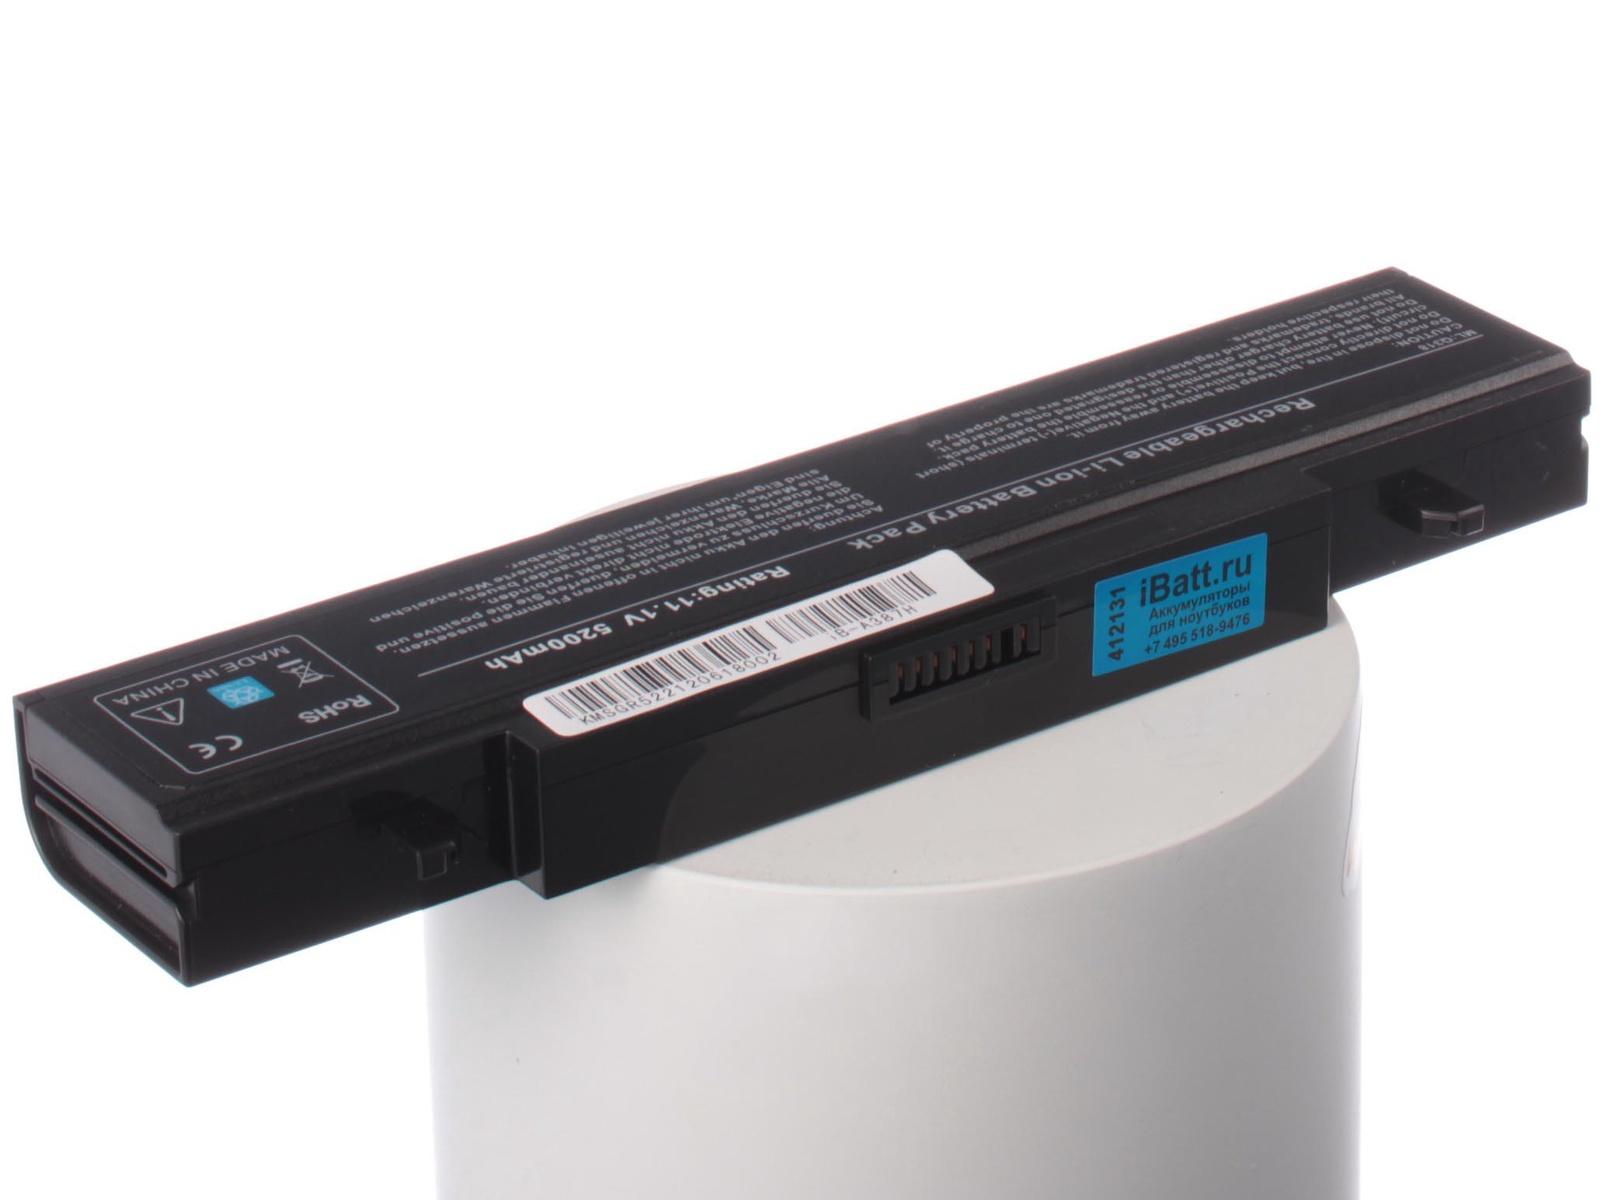 Аккумулятор для ноутбука iBatt для Samsung 300V5A-S05, 300V5A-S0J, 300V5A-S0S, 300V5A-S0T, 300V5A-S0V, 305V5A-S0B, 310E5C-A01, 350E5C-S0E, 350E7C-S0A, 350V5C-S0Z, 355V5C-S0L, ATIV Book 2 270E4E, NP-R39, NP-R39 plus, NP-R408 аккумулятор для ноутбука ibatt для samsung 355e5x rv518 rv720 350e7c 355e5c 305e7a np r590 350v5x ativ book 2 np r440l np r522 np r469 q530 q430 r423 200a5b 305v5a s0k 355v5x 355e5x a01 300e7z s02 200a4b